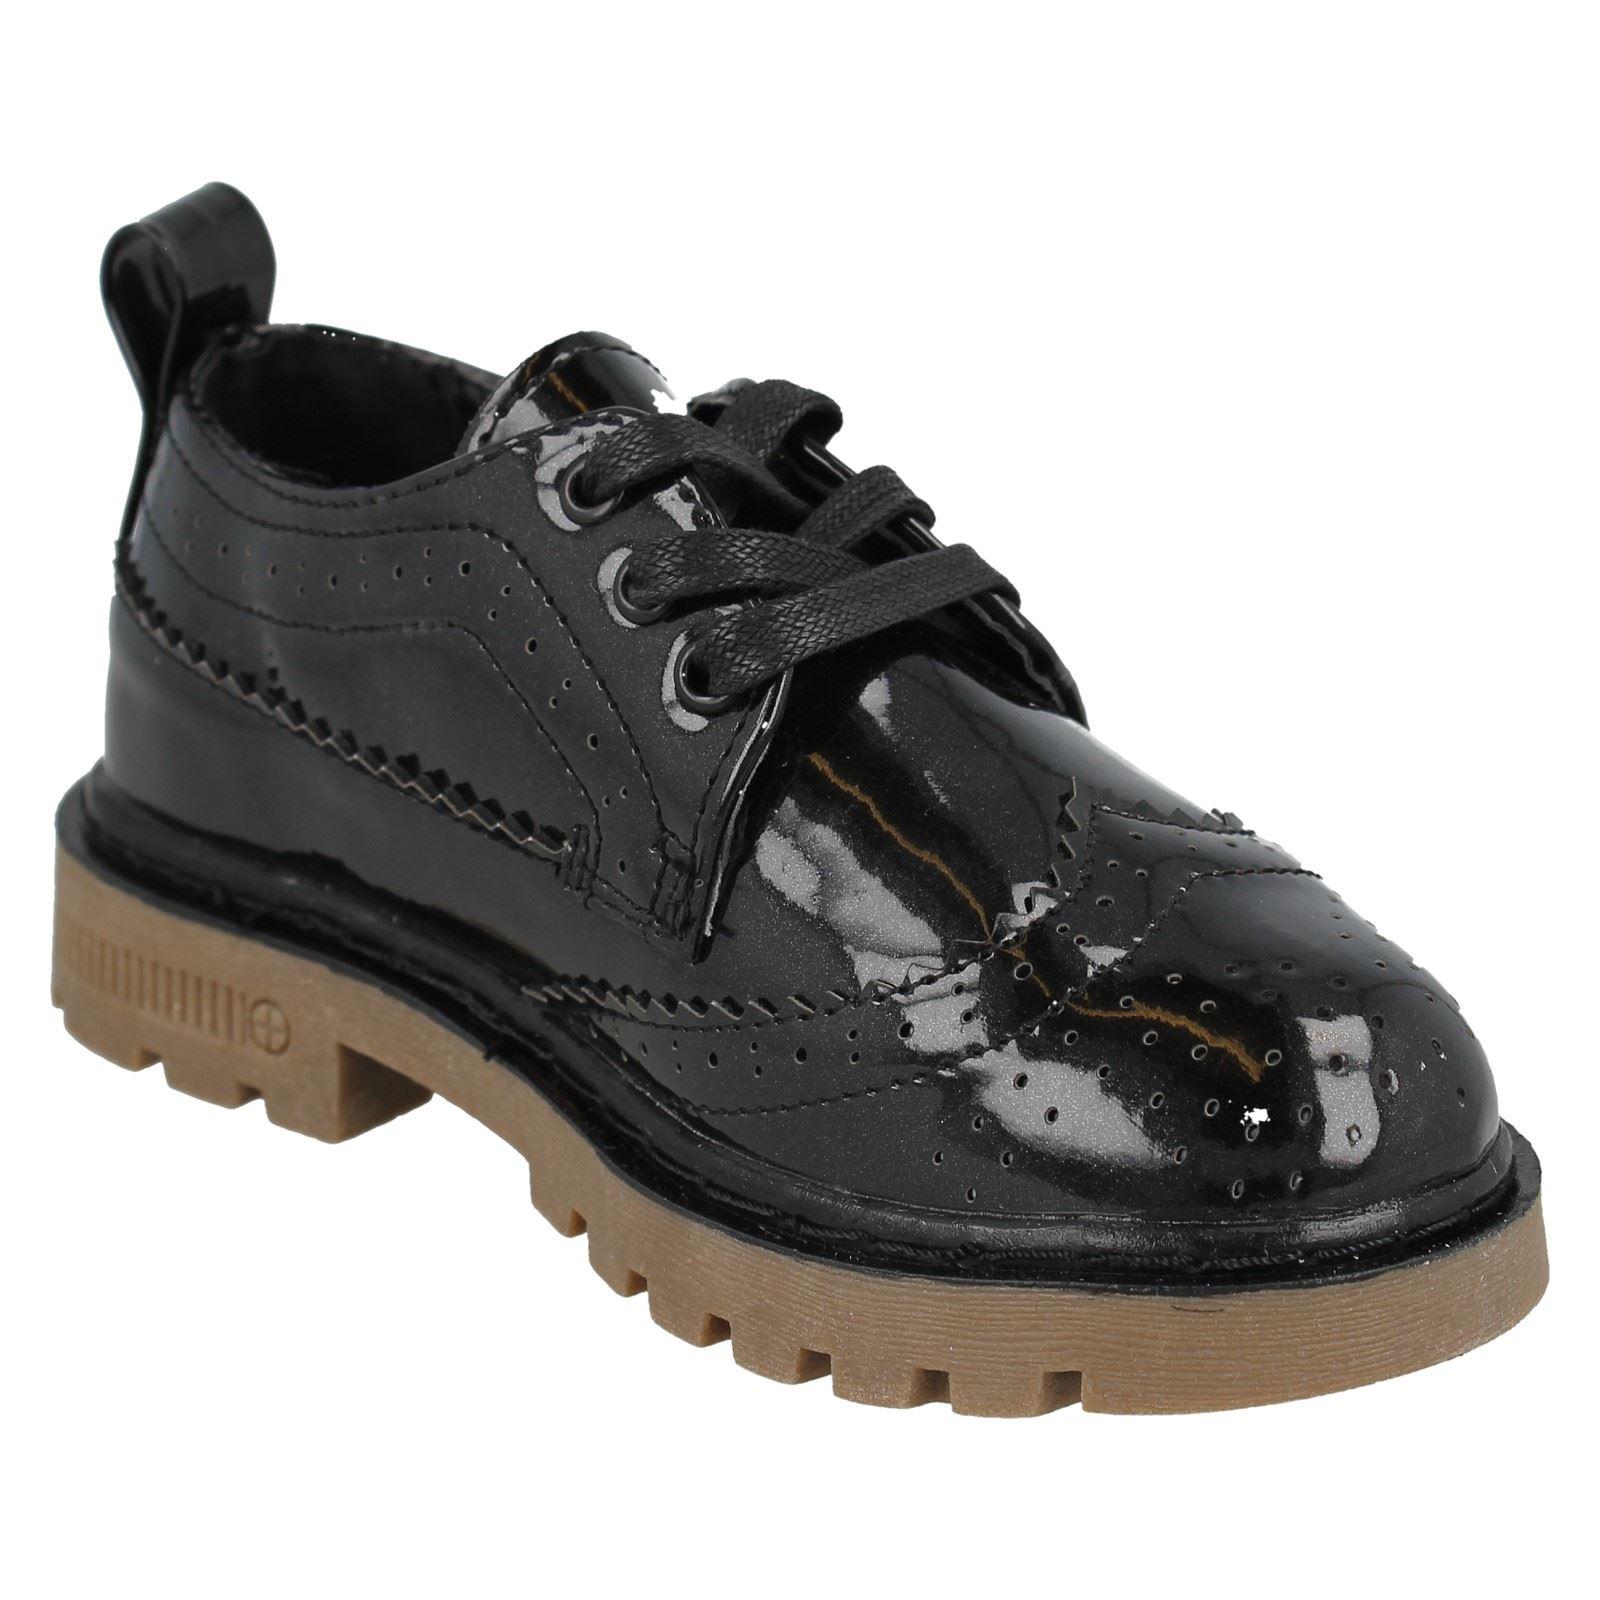 Damen Schuhe Freizeitschuhe designer Sneakers 8711 Pink Multi 40